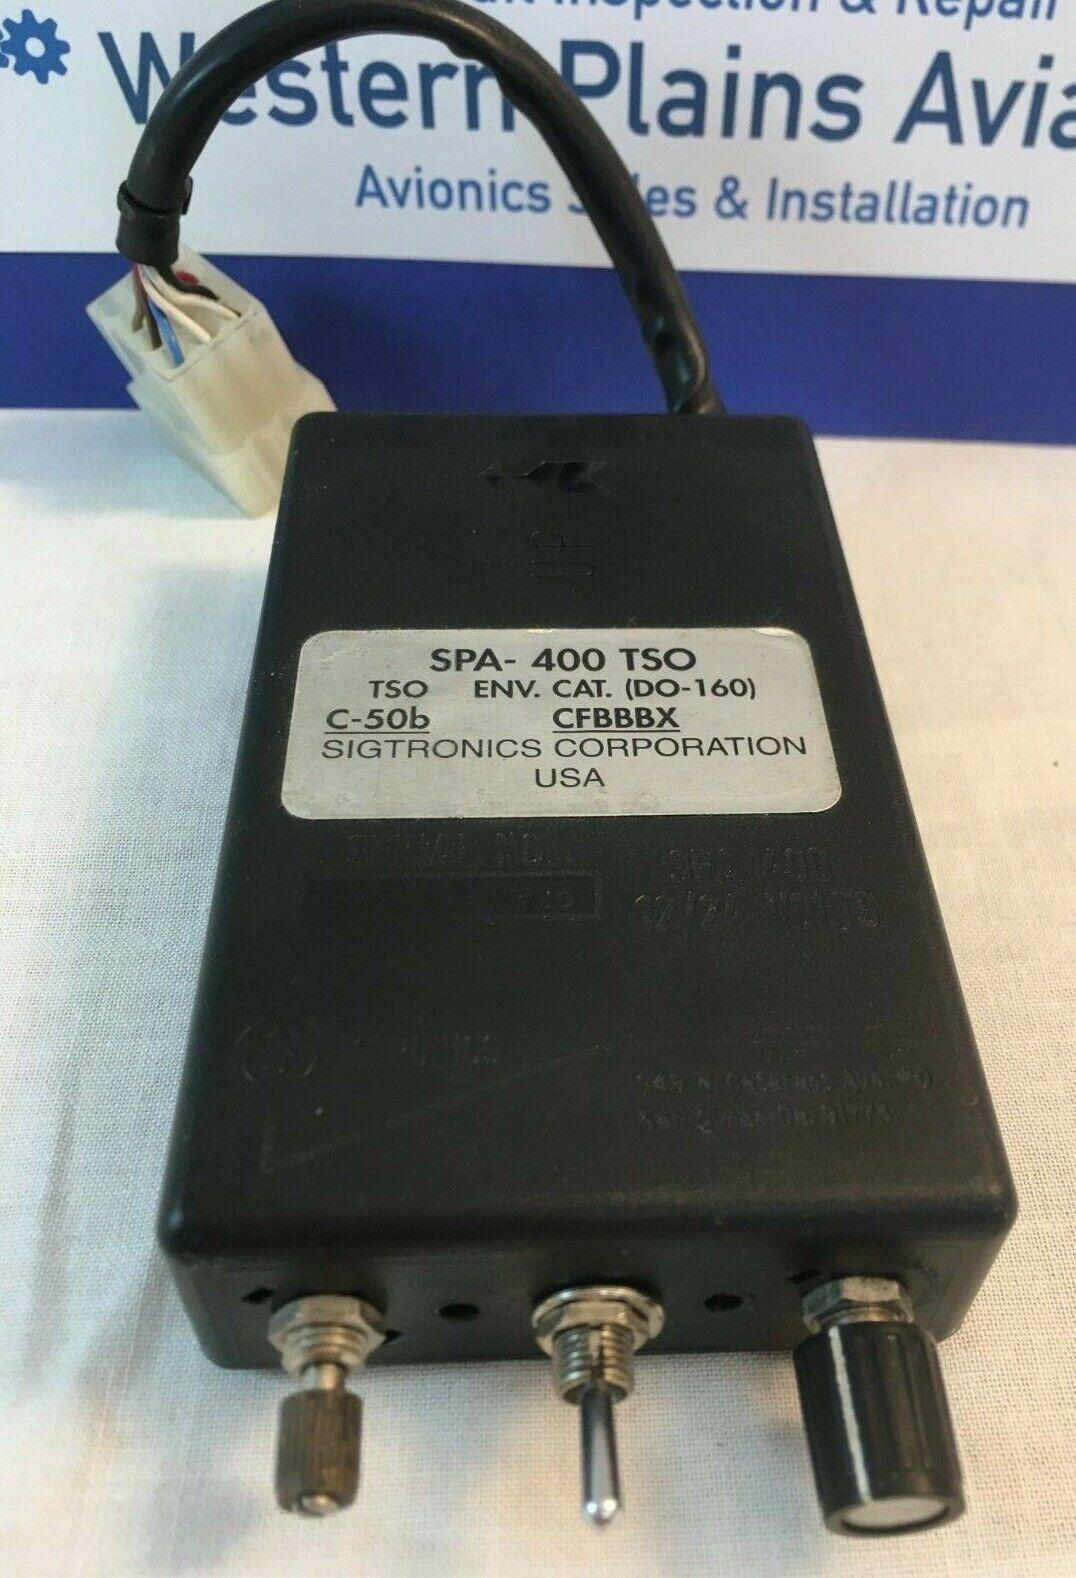 Sigtronics Corporation SPA-400 TSO Innercom